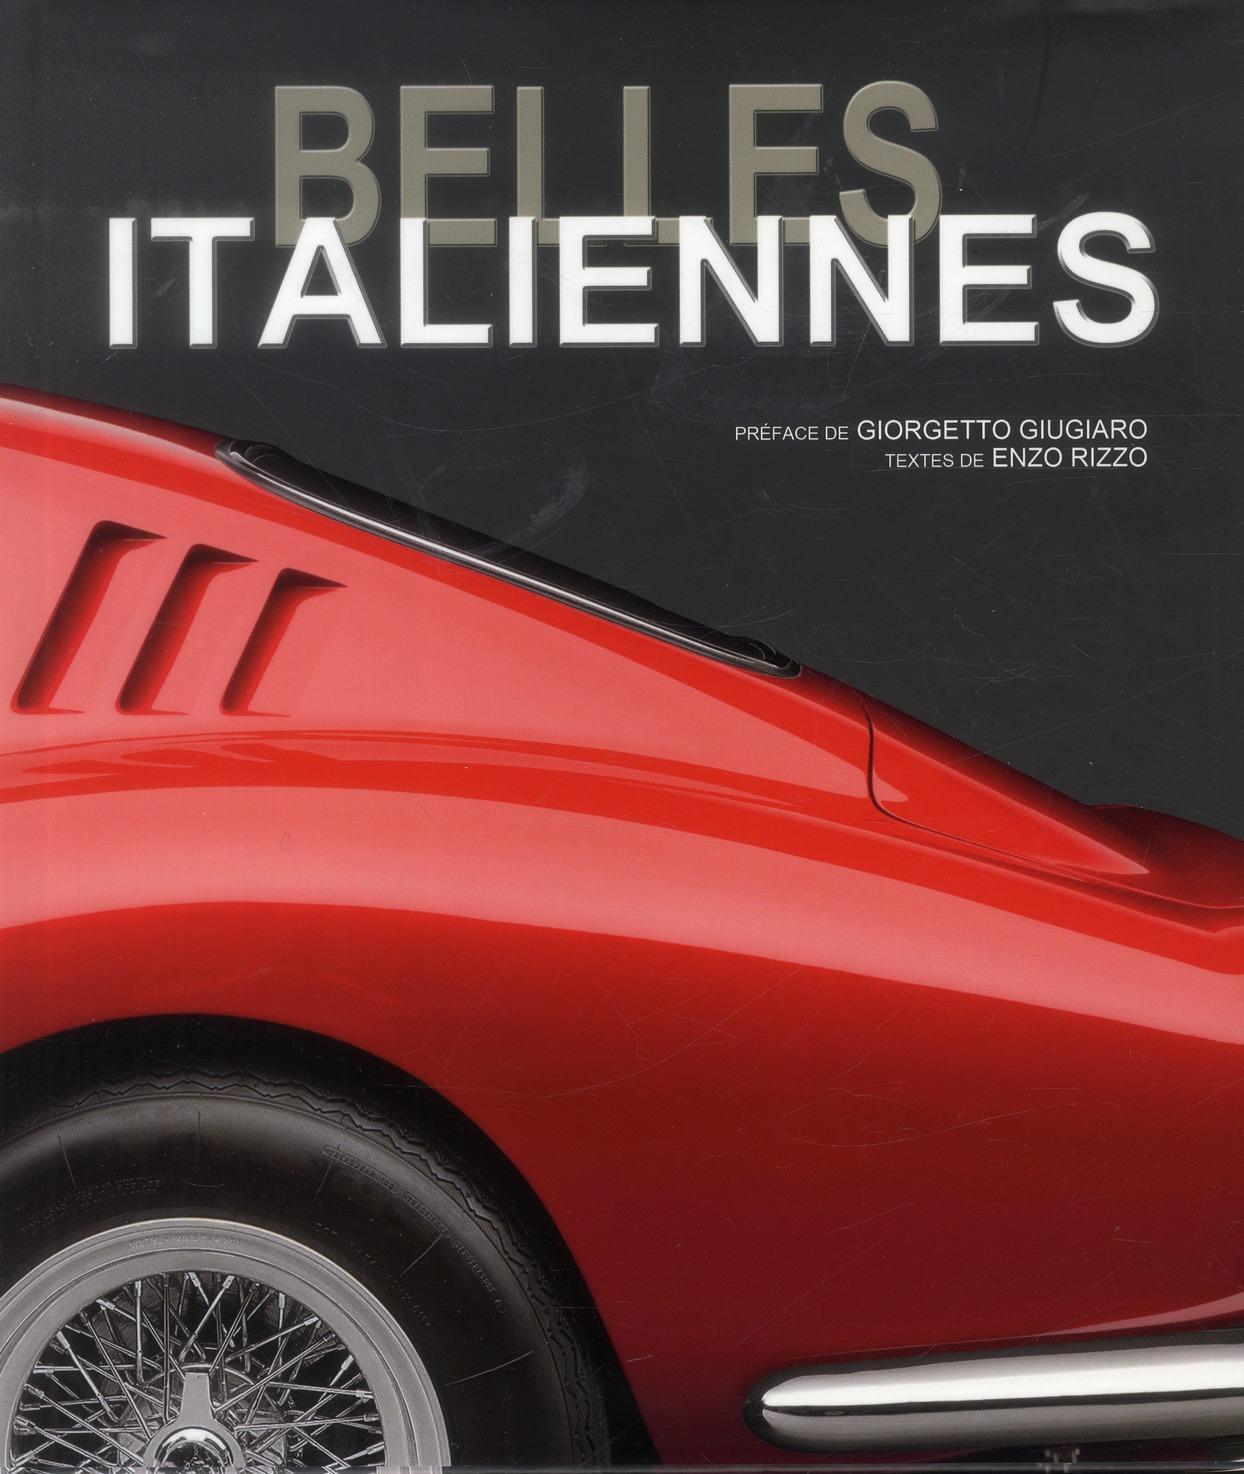 BELLES ITALIENNES